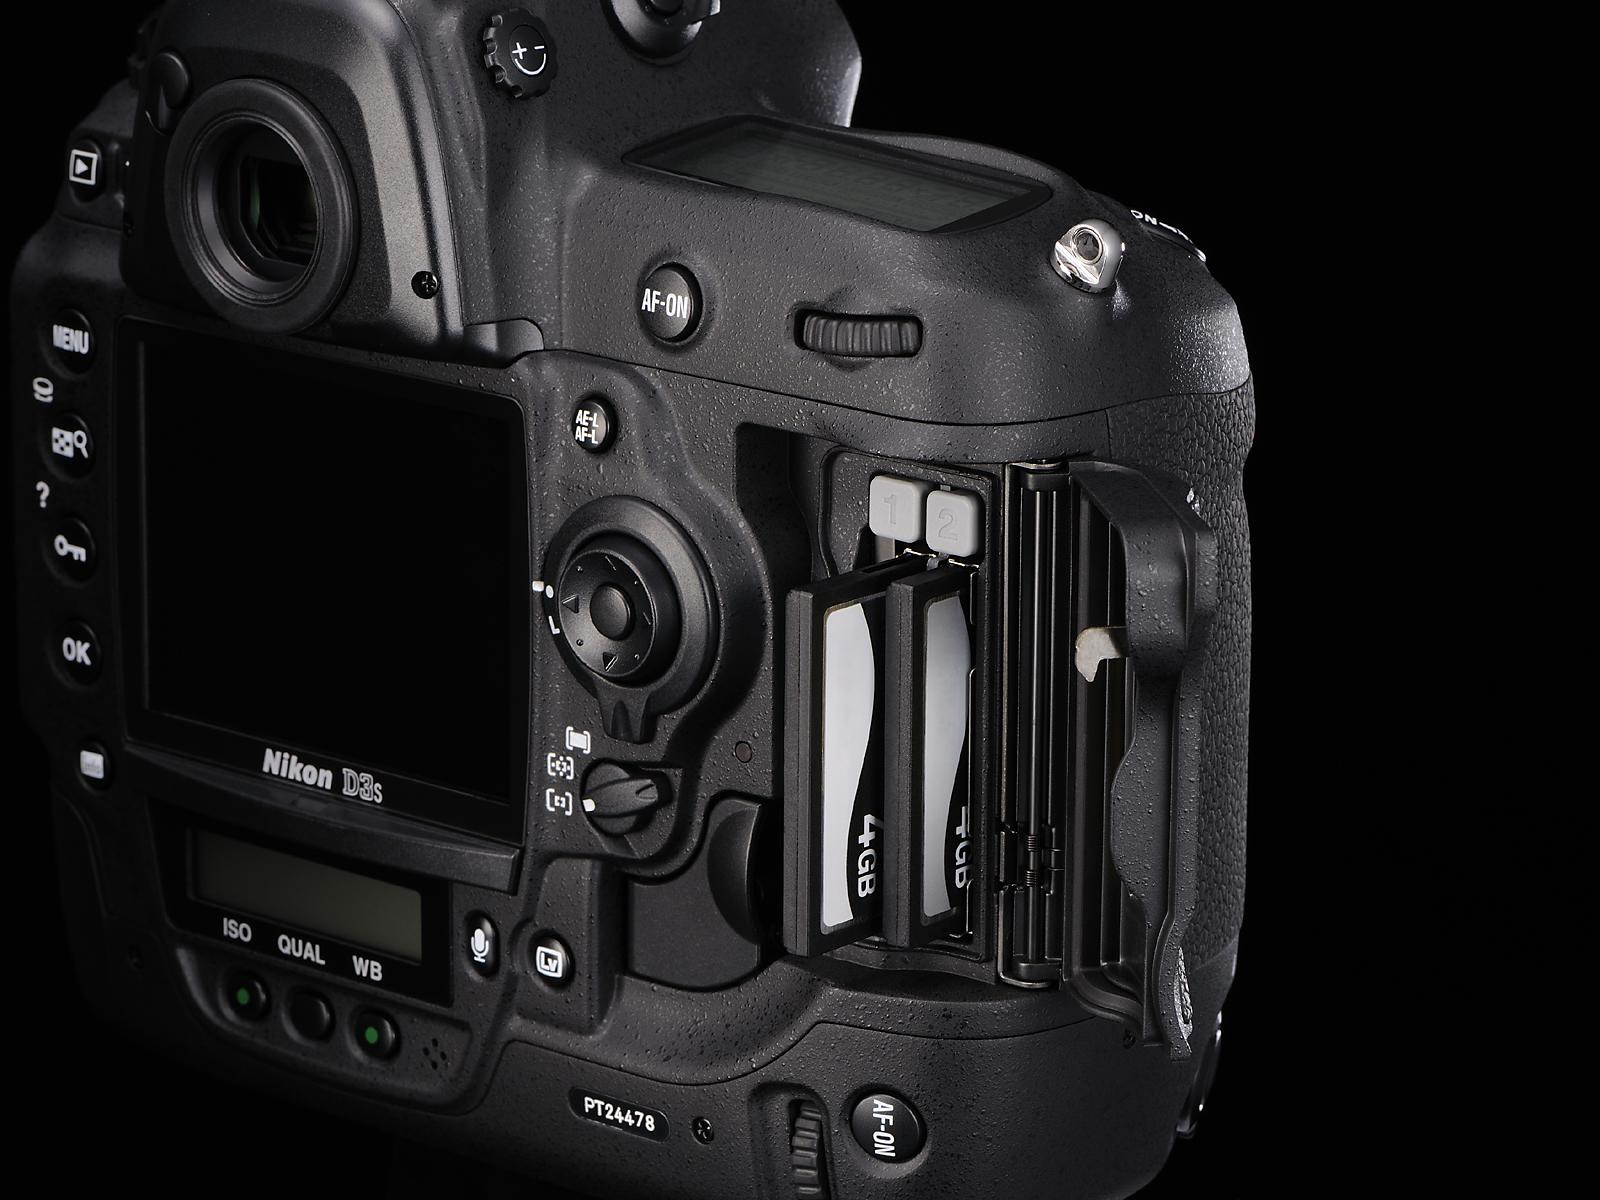 Nikon D3s koster skjorta men har dobbel minnekortplass